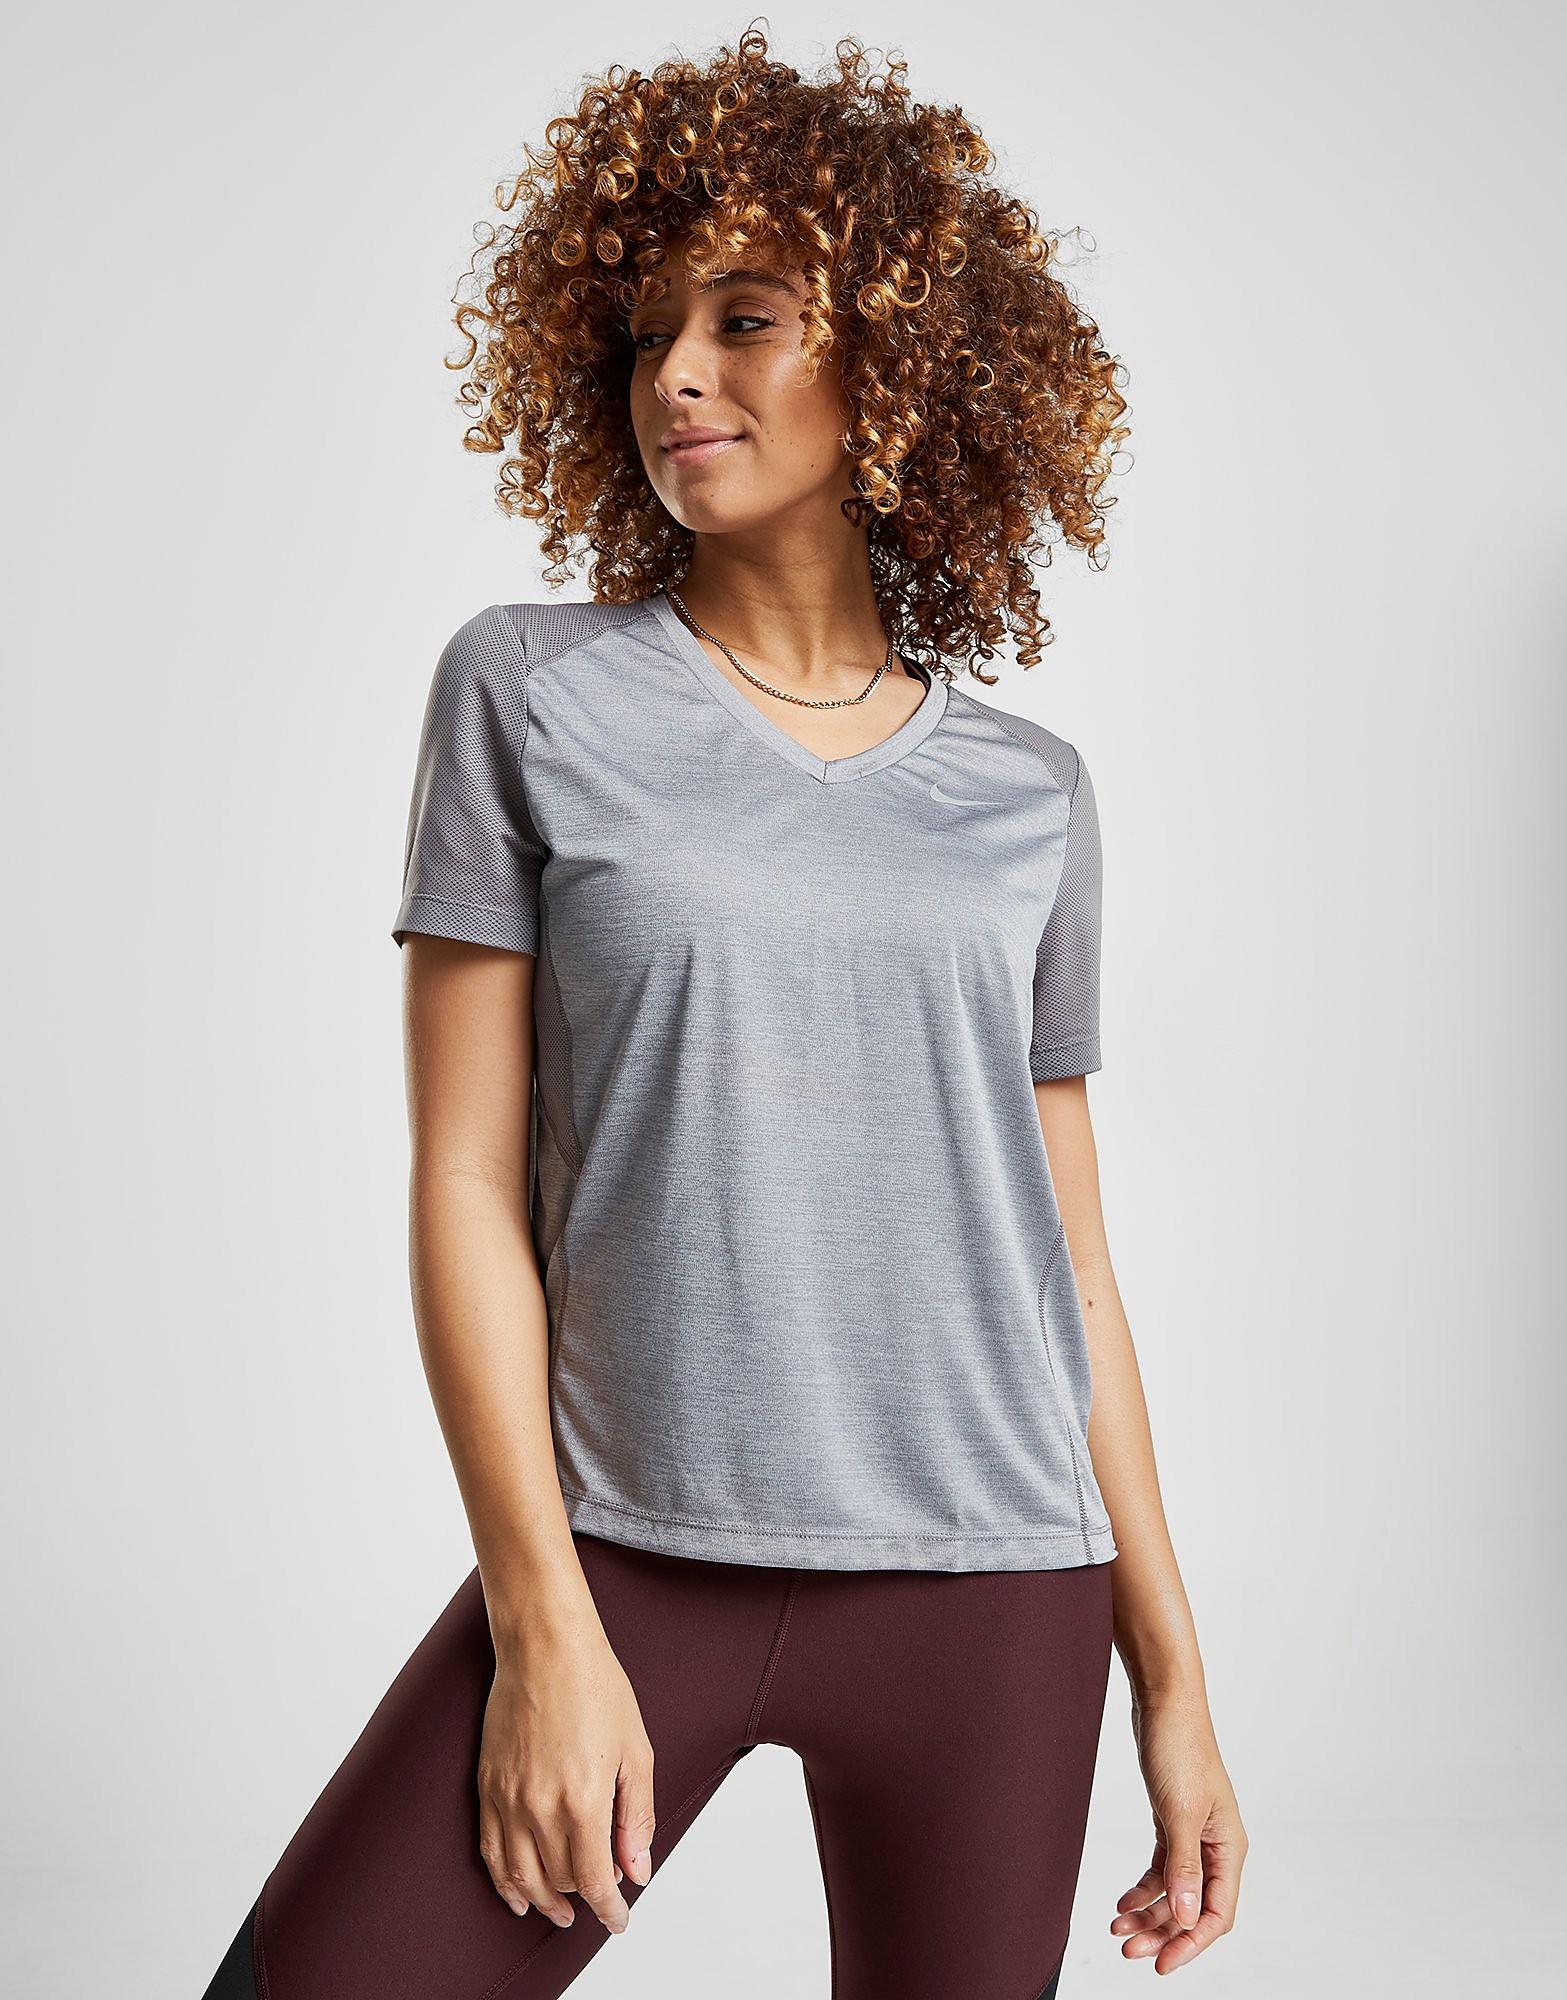 Nike Running Miler Short Sleeve T-Shirt - Grijs - Dames